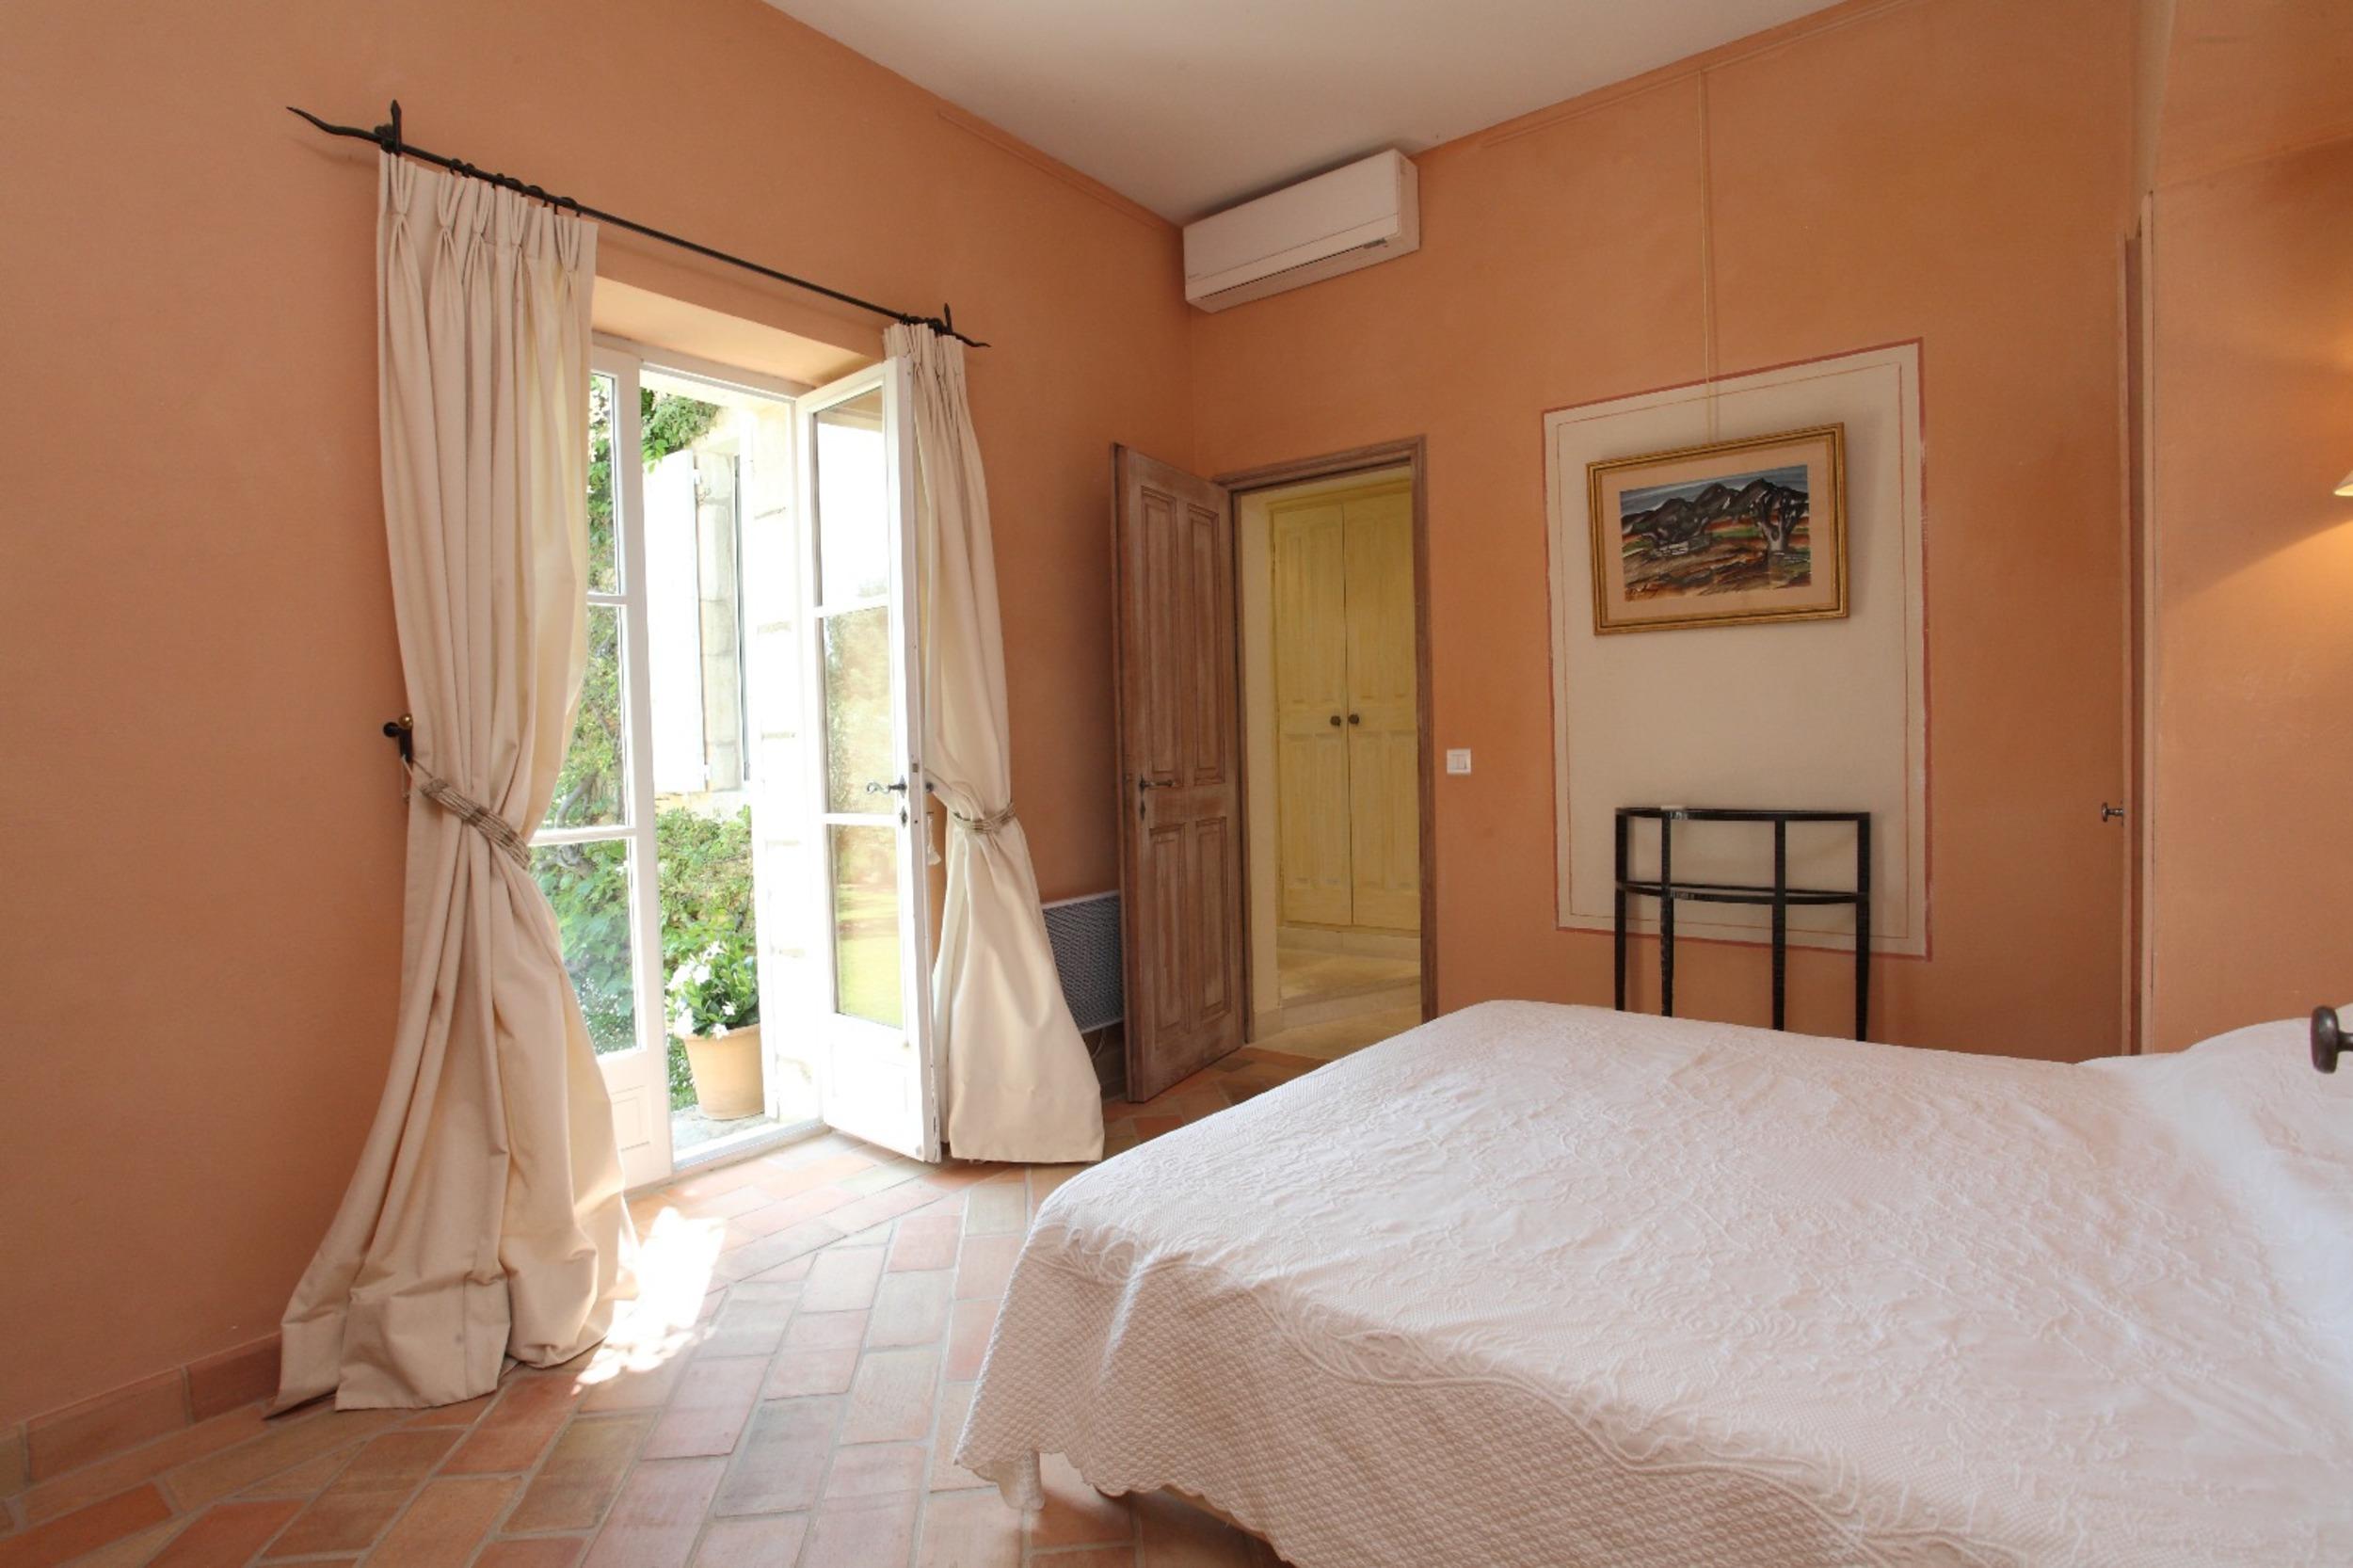 Holiday house Der Fall - Fabelhaftes Landhaus in Gordes (2520443), Gordes, Vaucluse, Provence - Alps - Côte d'Azur, France, picture 19